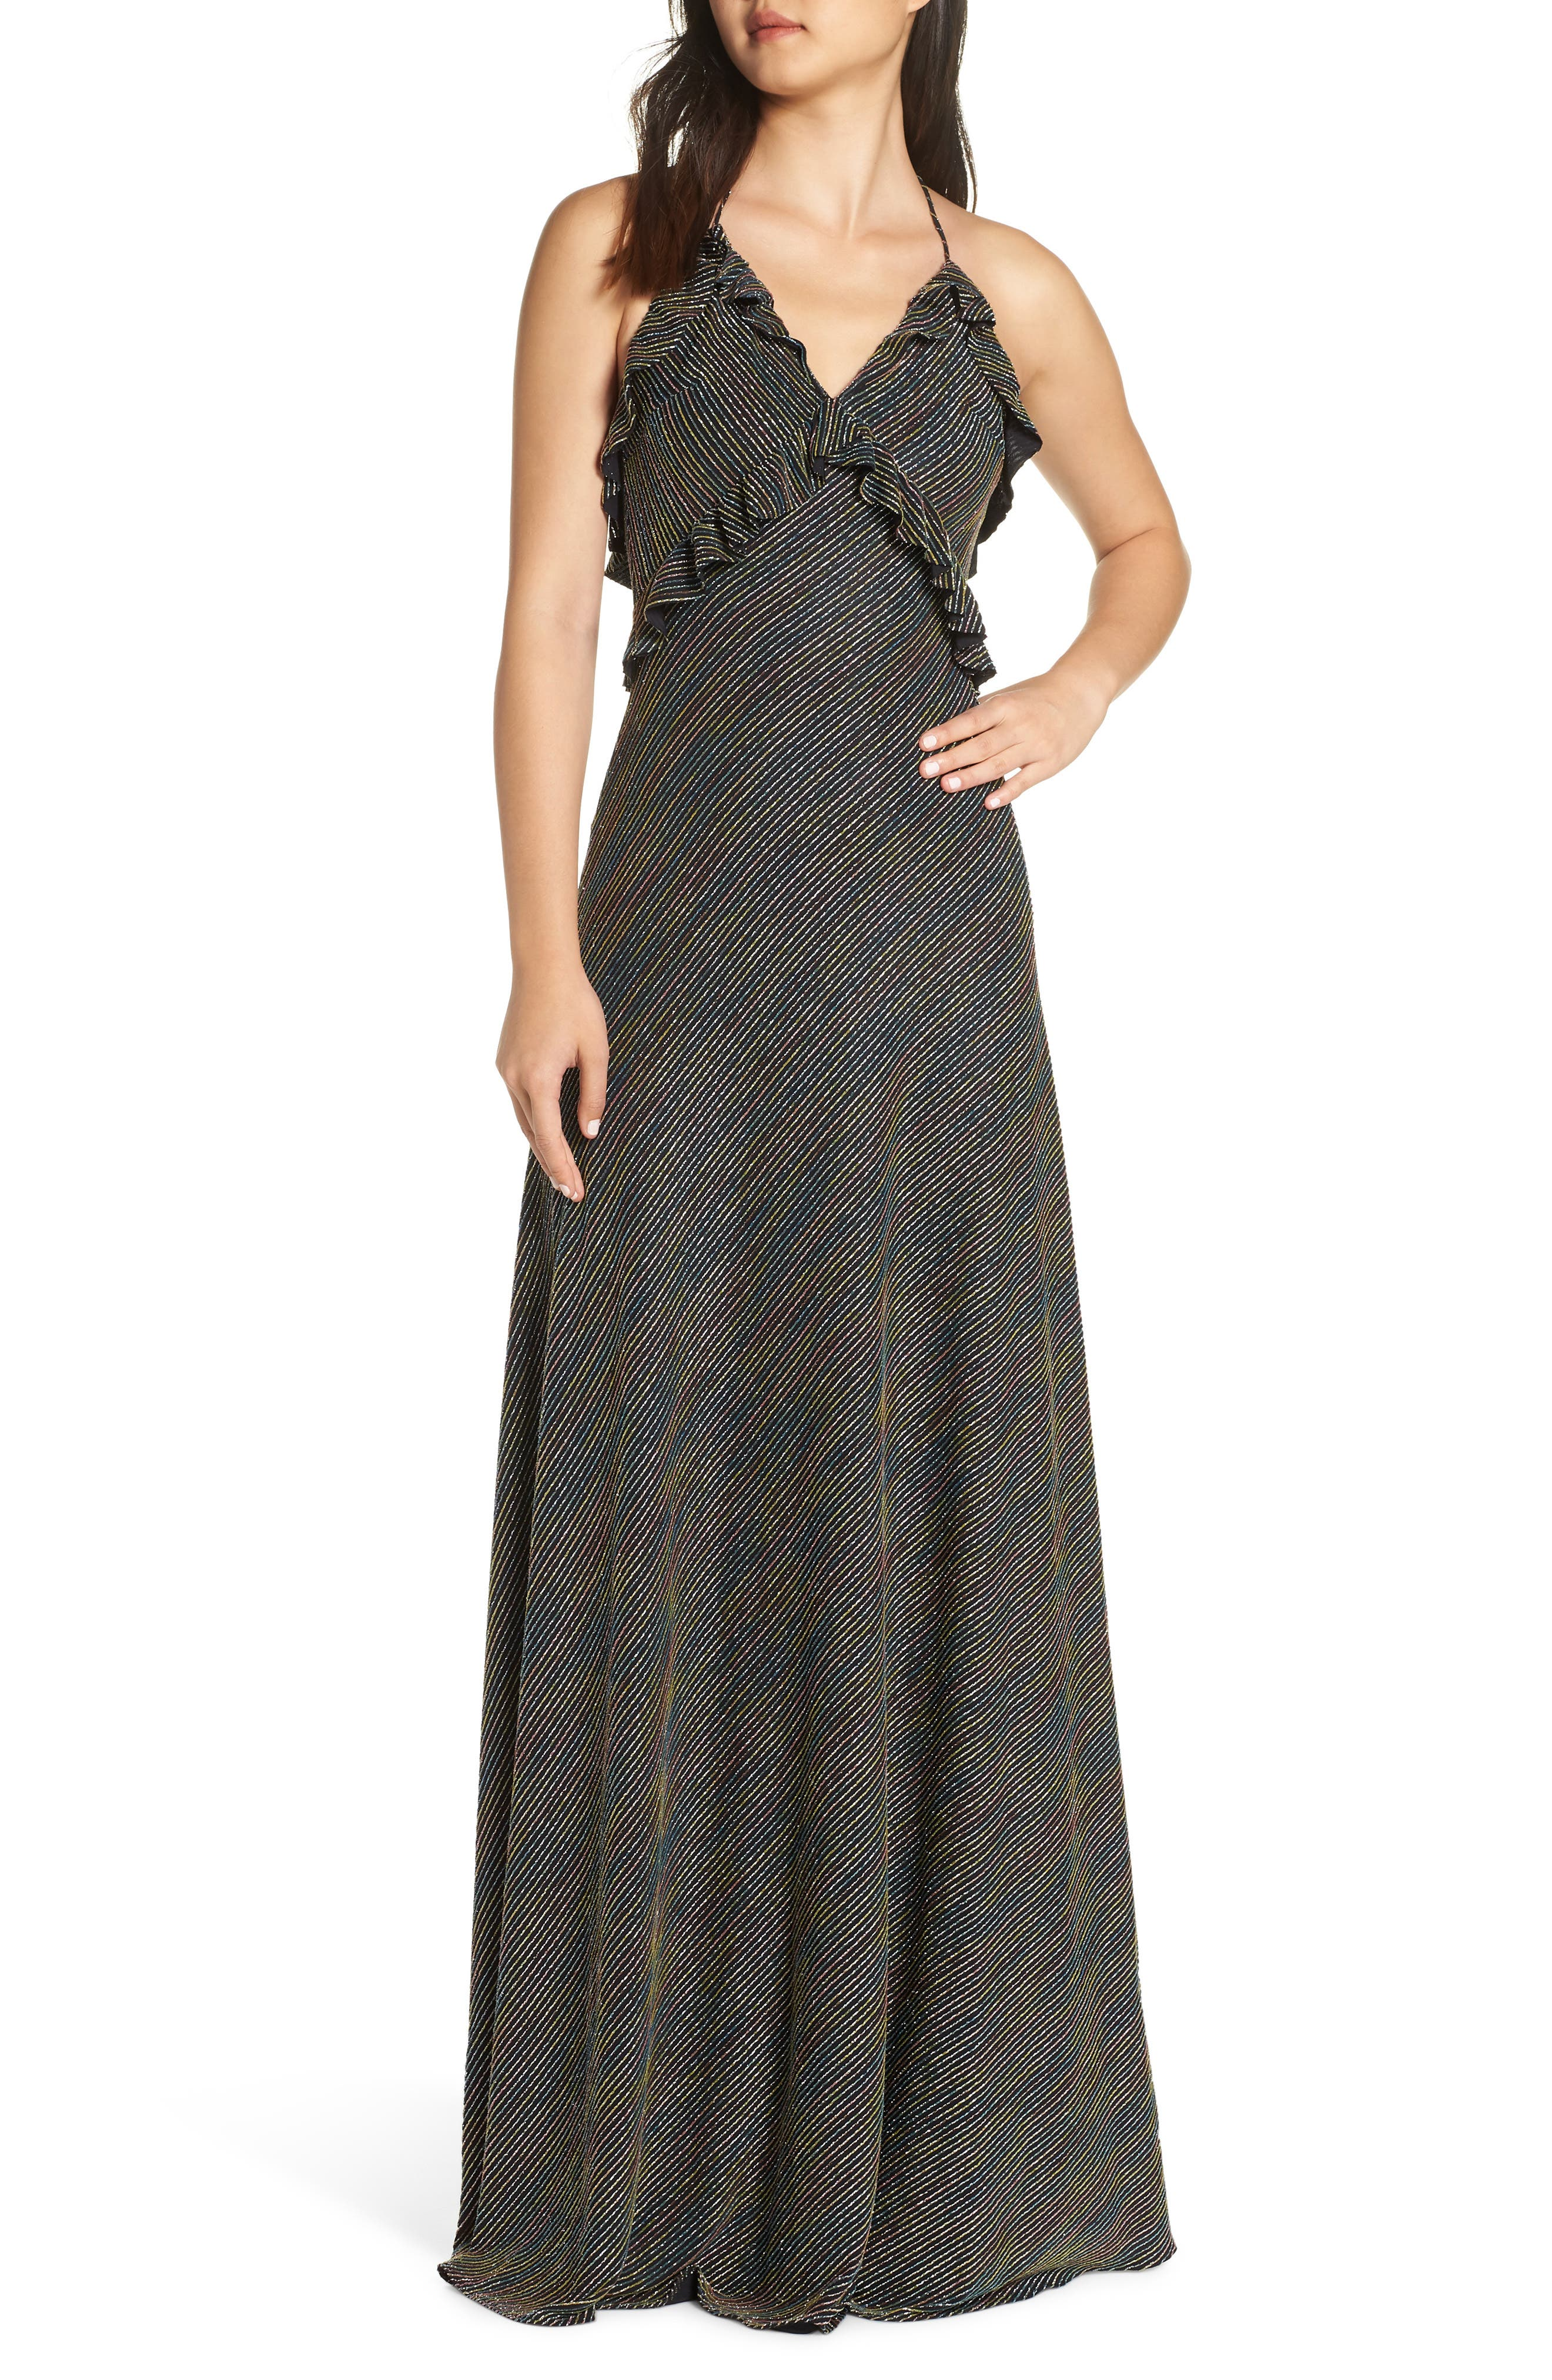 JILL JILL STUART Marjan Metallic Knit Gown, Main, color, SILVER MULTI